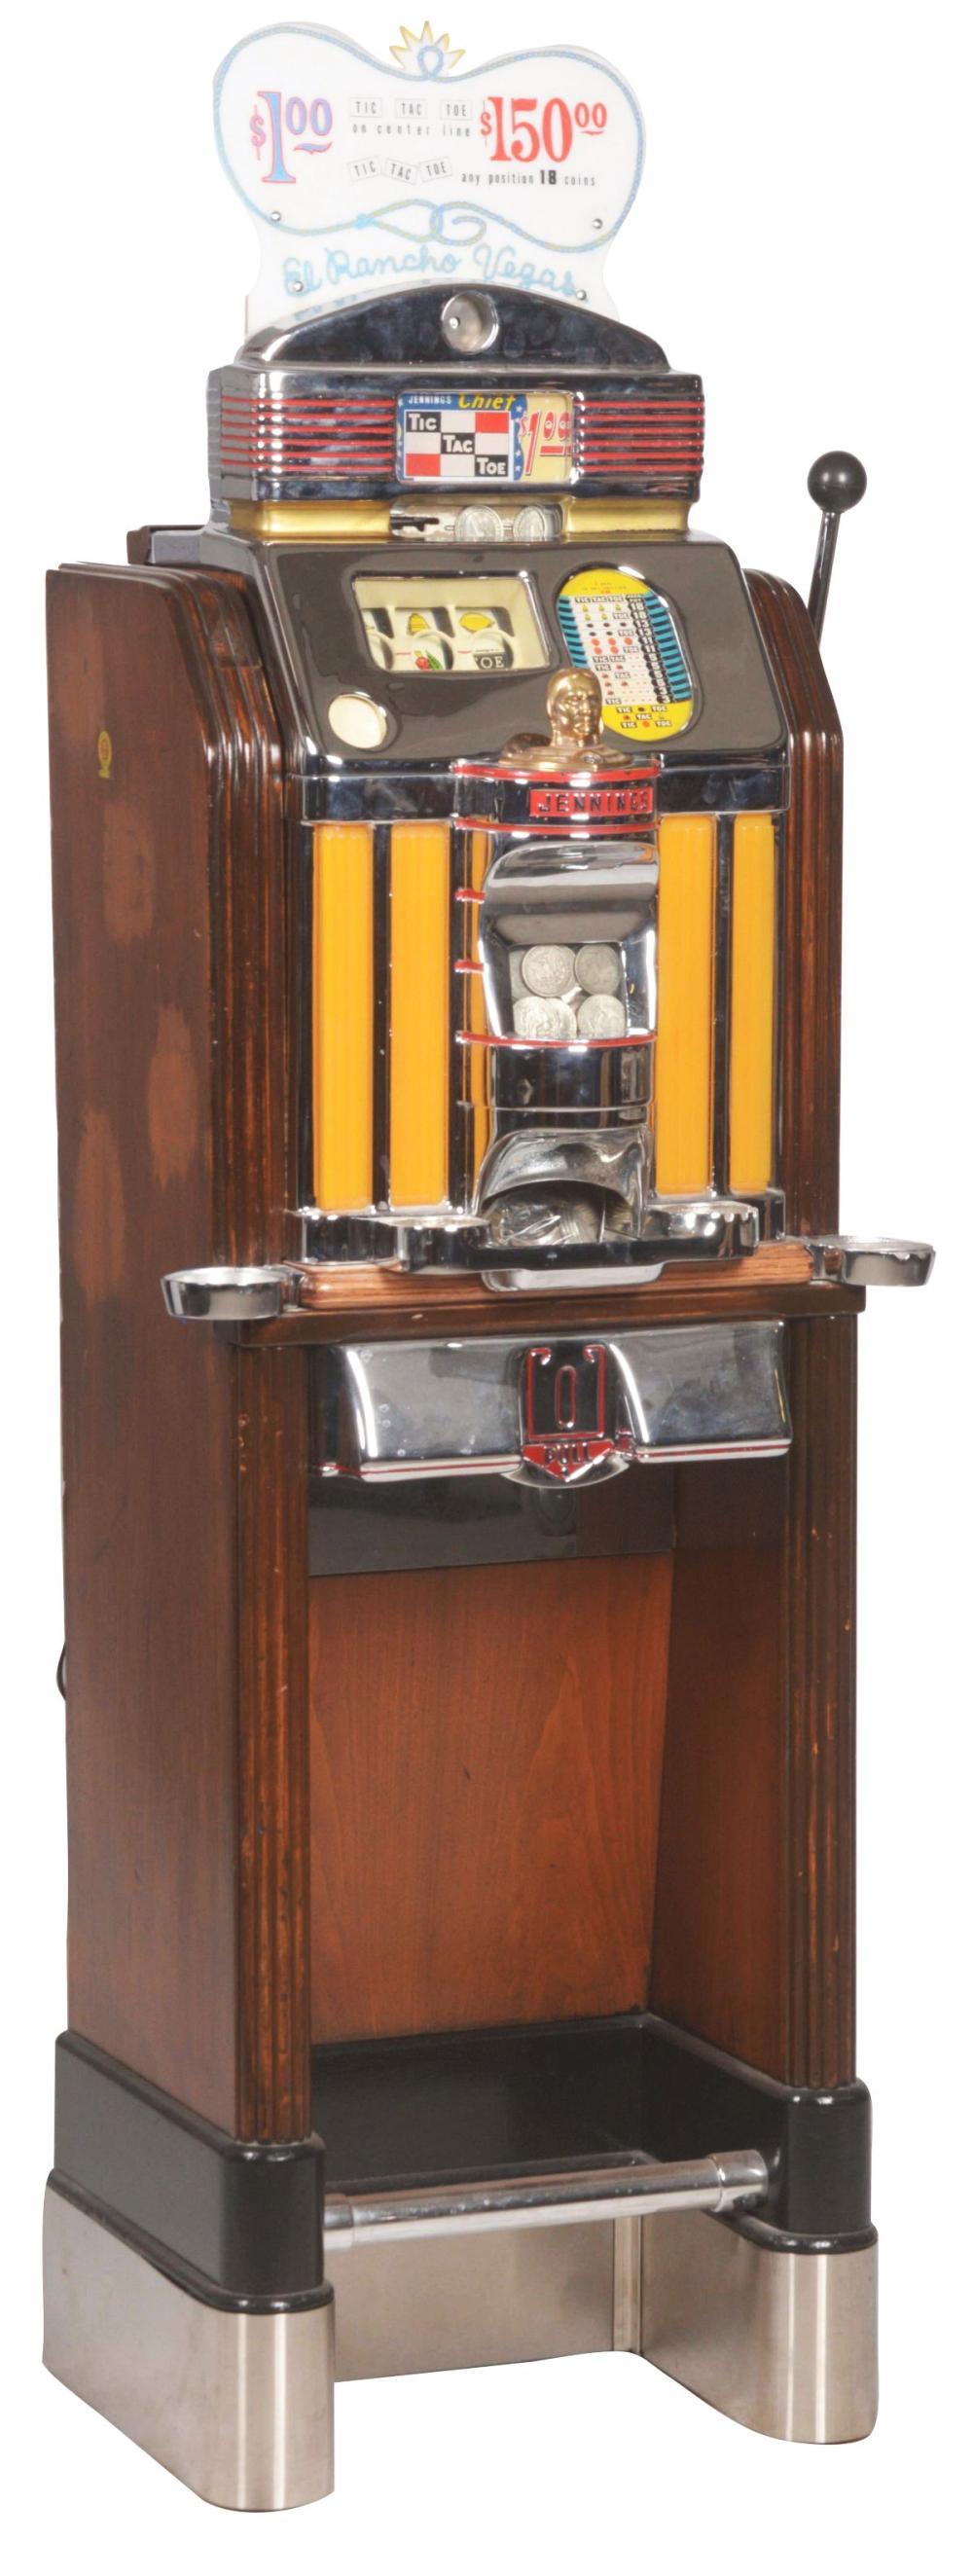 $1 JENNINGS TIC-TAC-TOE CLUB CHIEF LIGHT-UP CONSOLE SLOT.